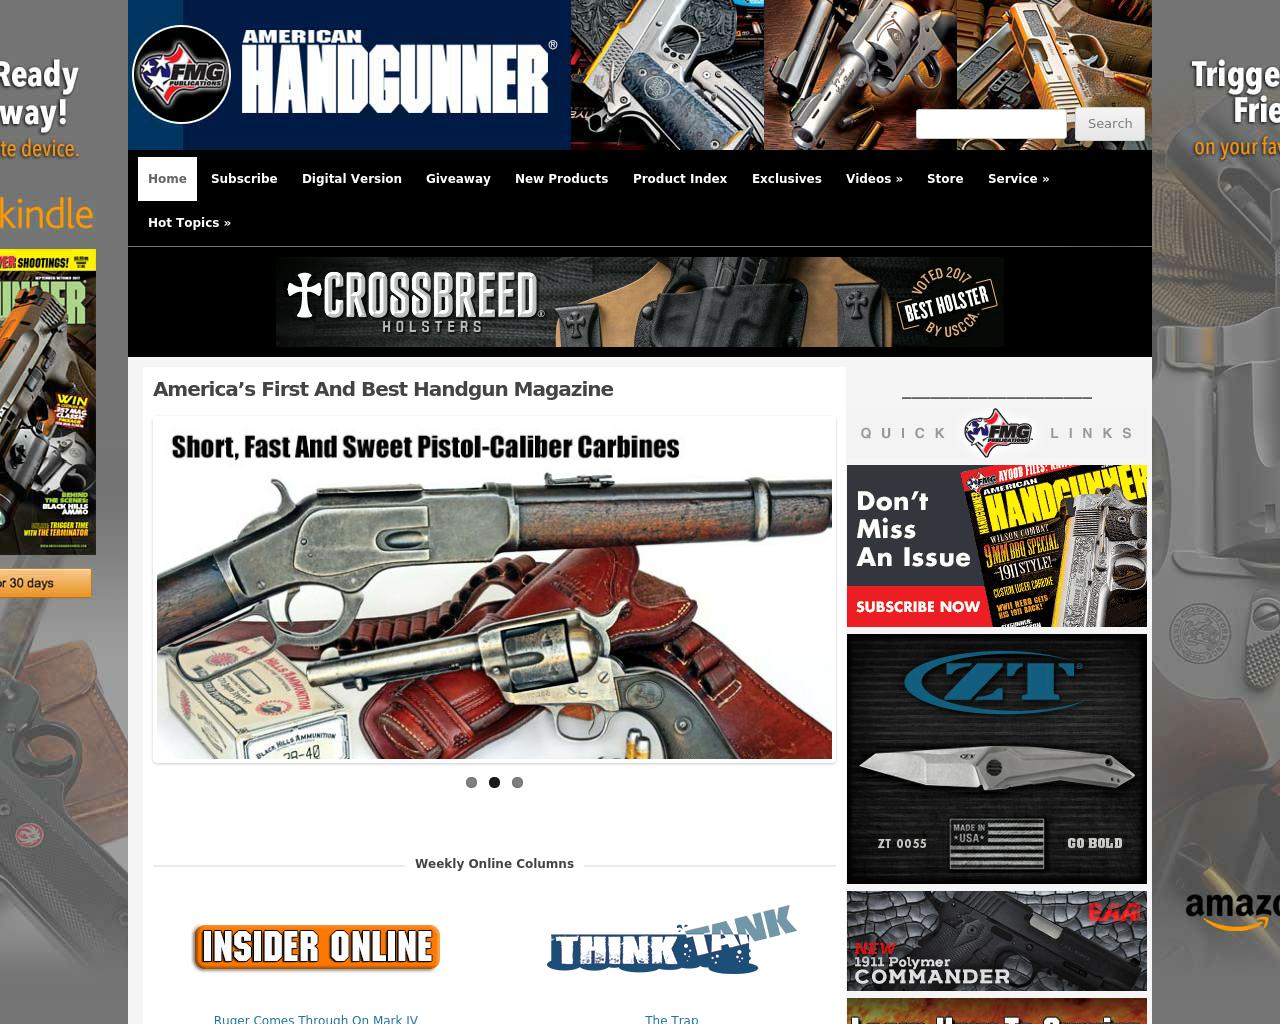 American-Handgunner-Advertising-Reviews-Pricing